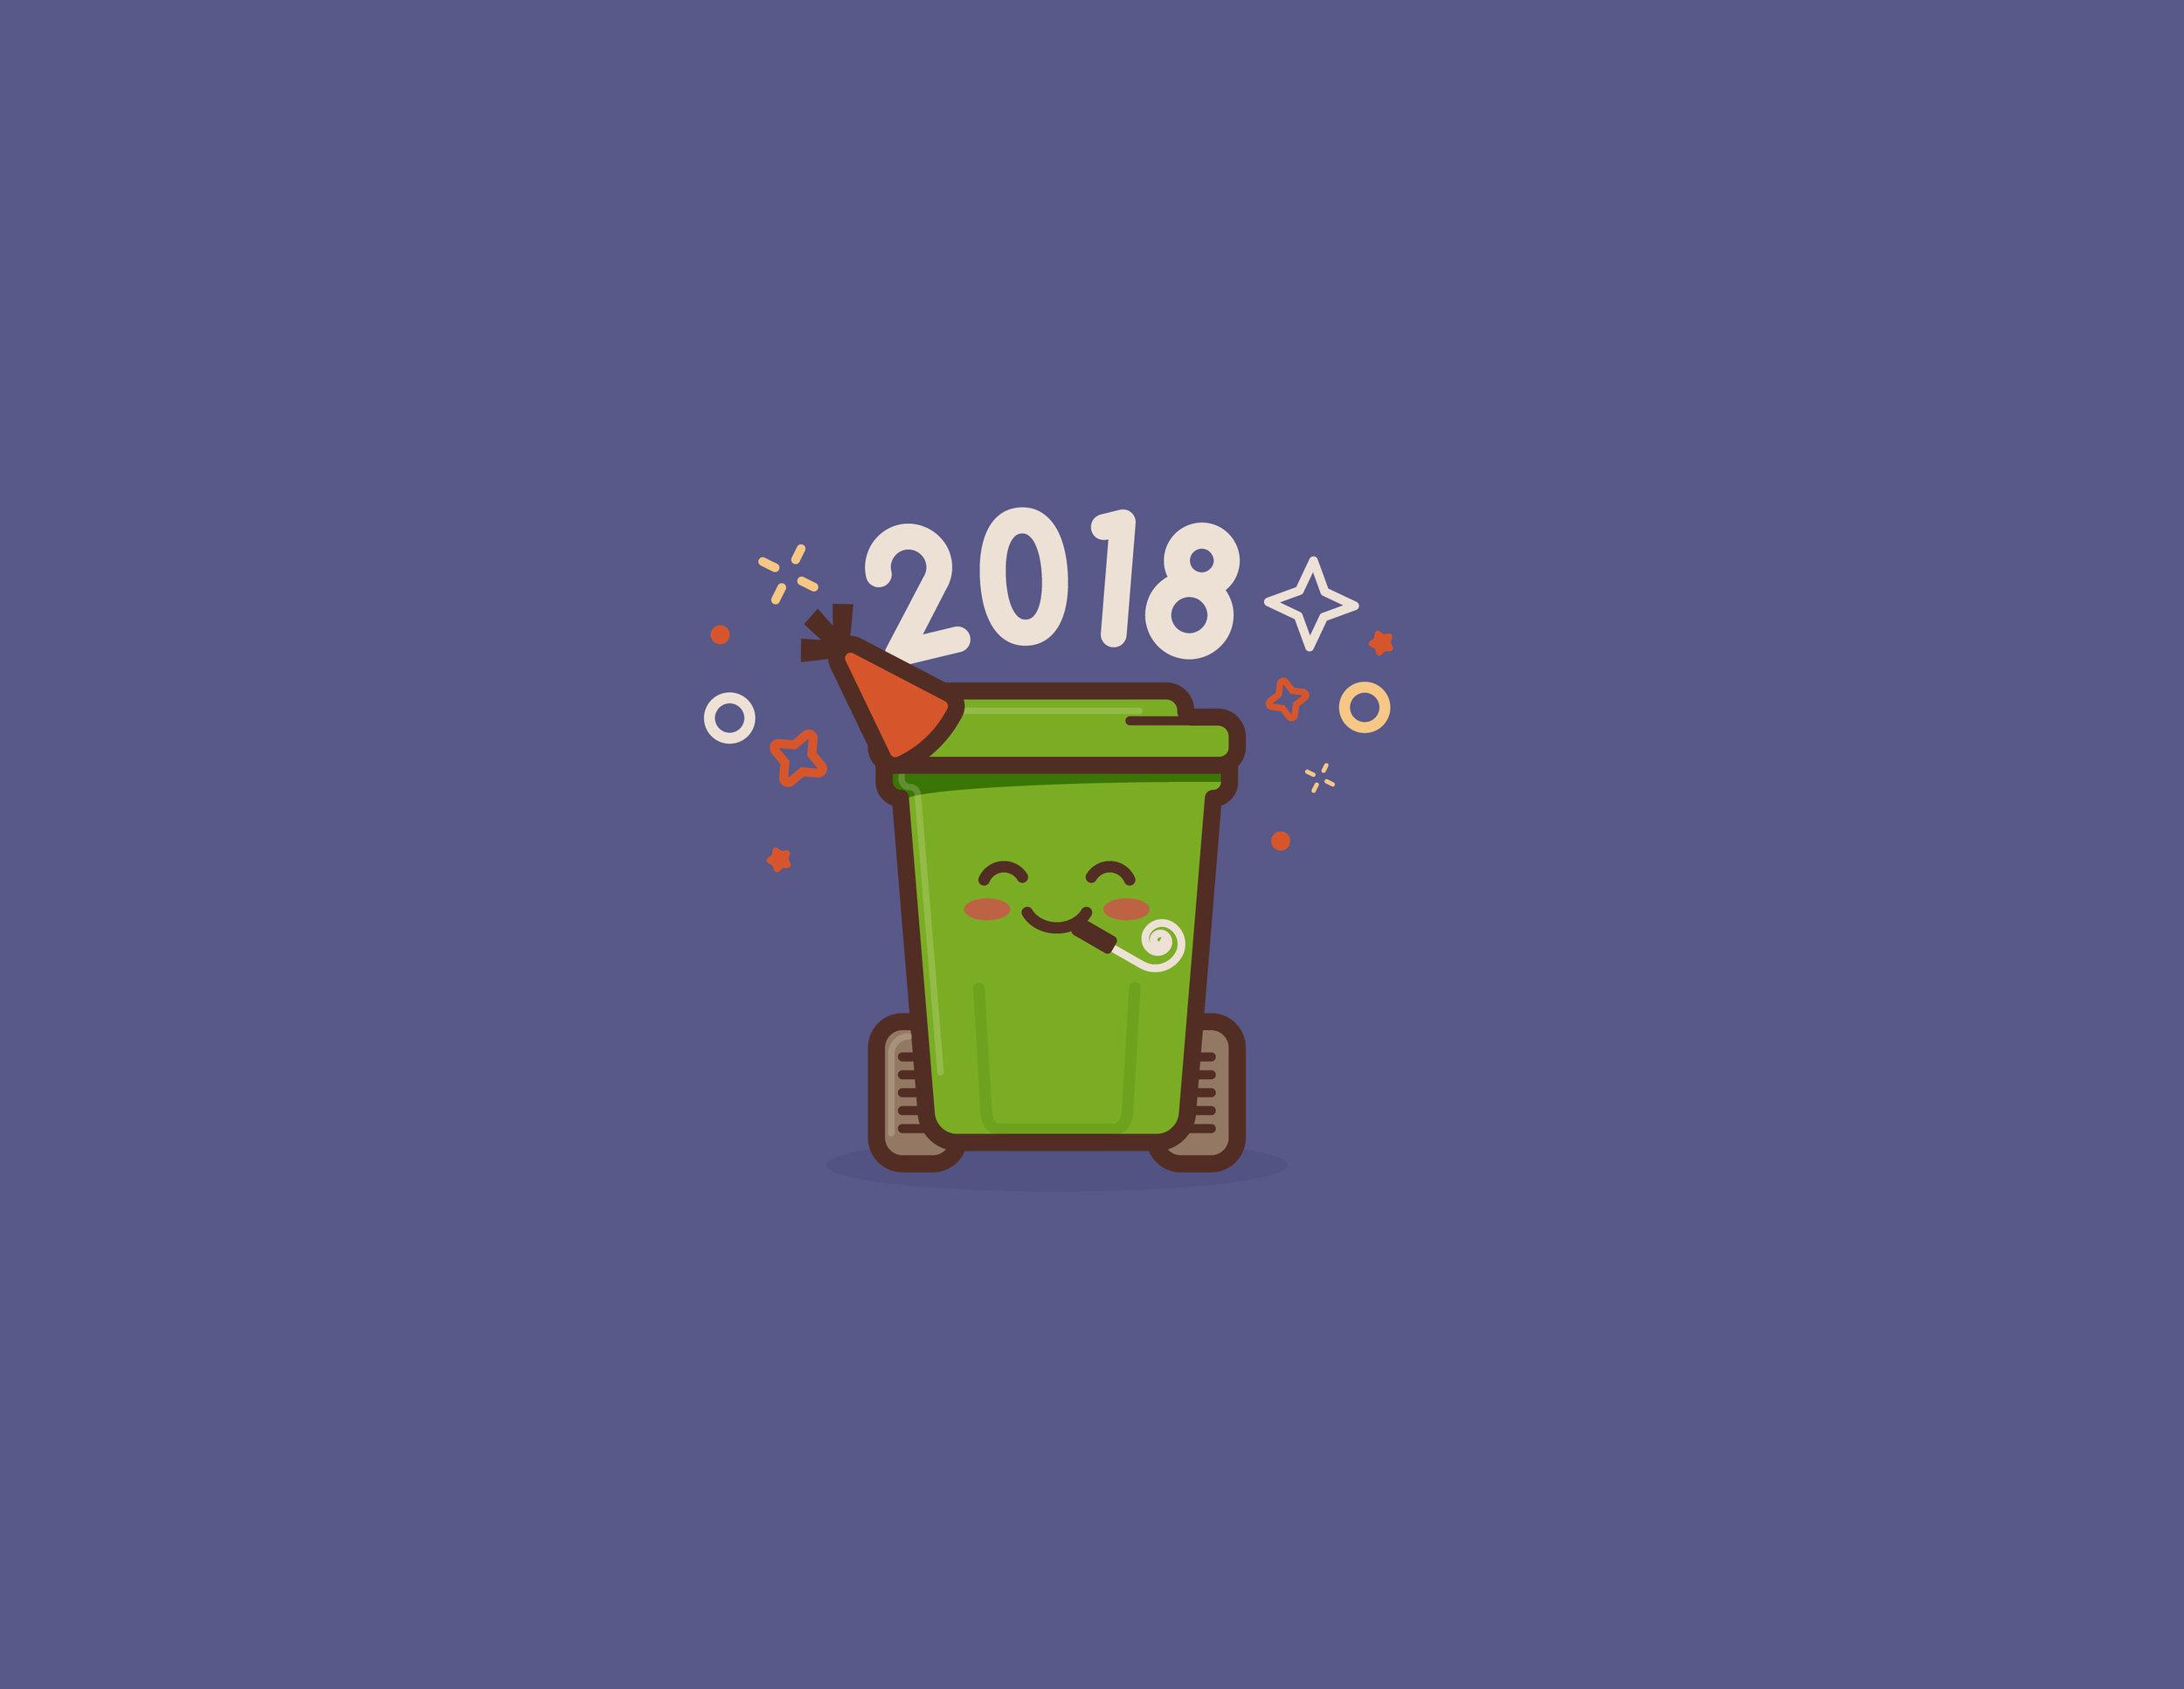 MESCHIERI_ADDY_2018_SCRAPPY_82_ILLUSTRATION_newyears.jpg